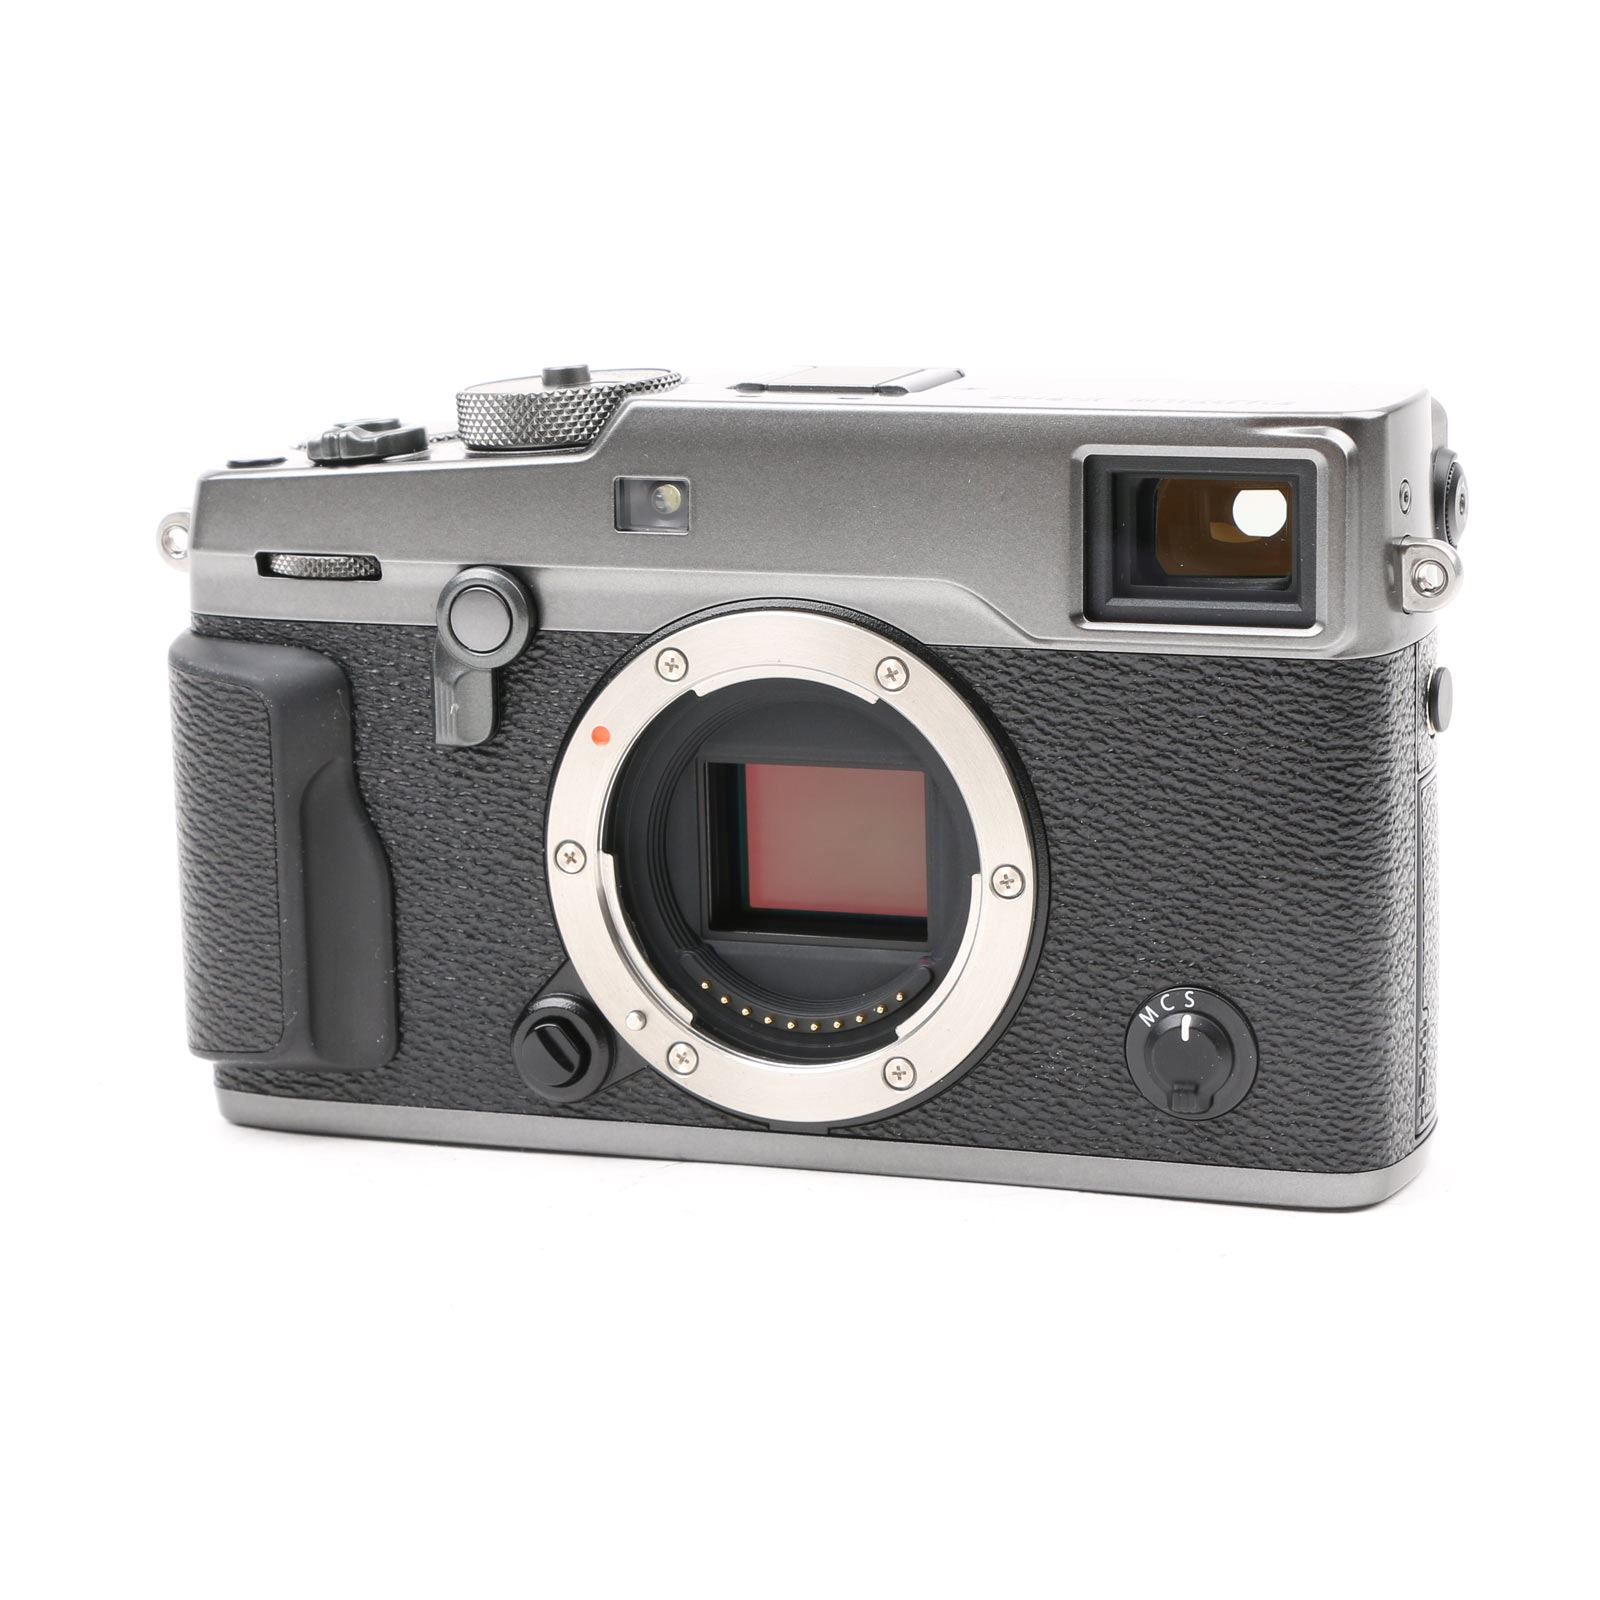 Image of Used Fujifilm X-Pro2 Digital Camera Body - Graphite Edition